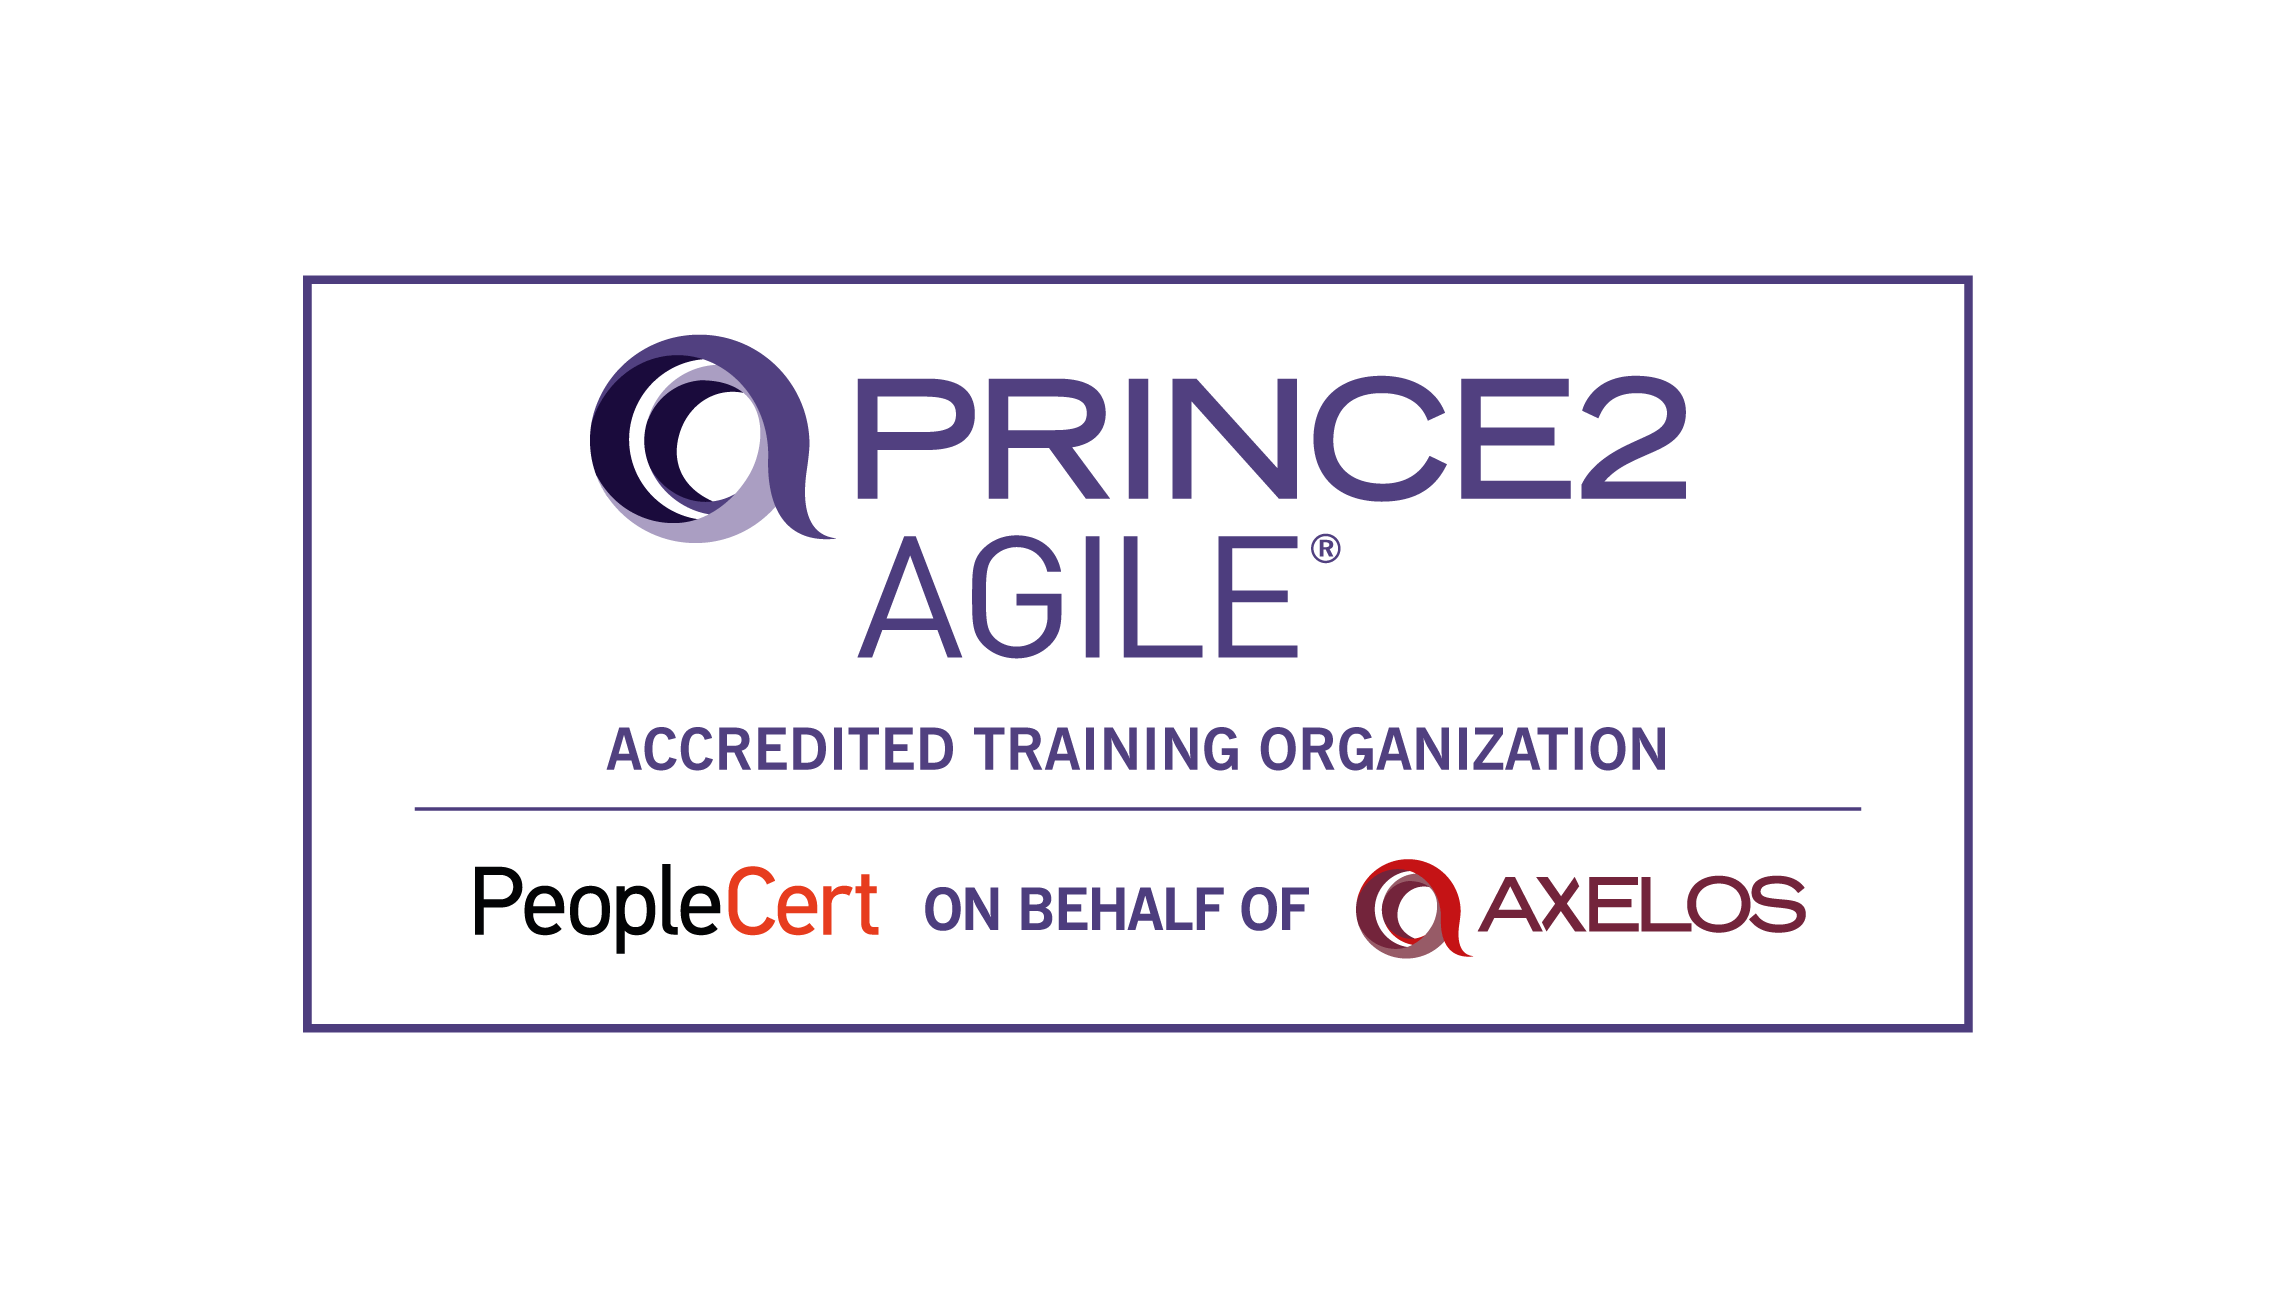 Training, Handlungsempfehlungen, PRINCE2 Agile®